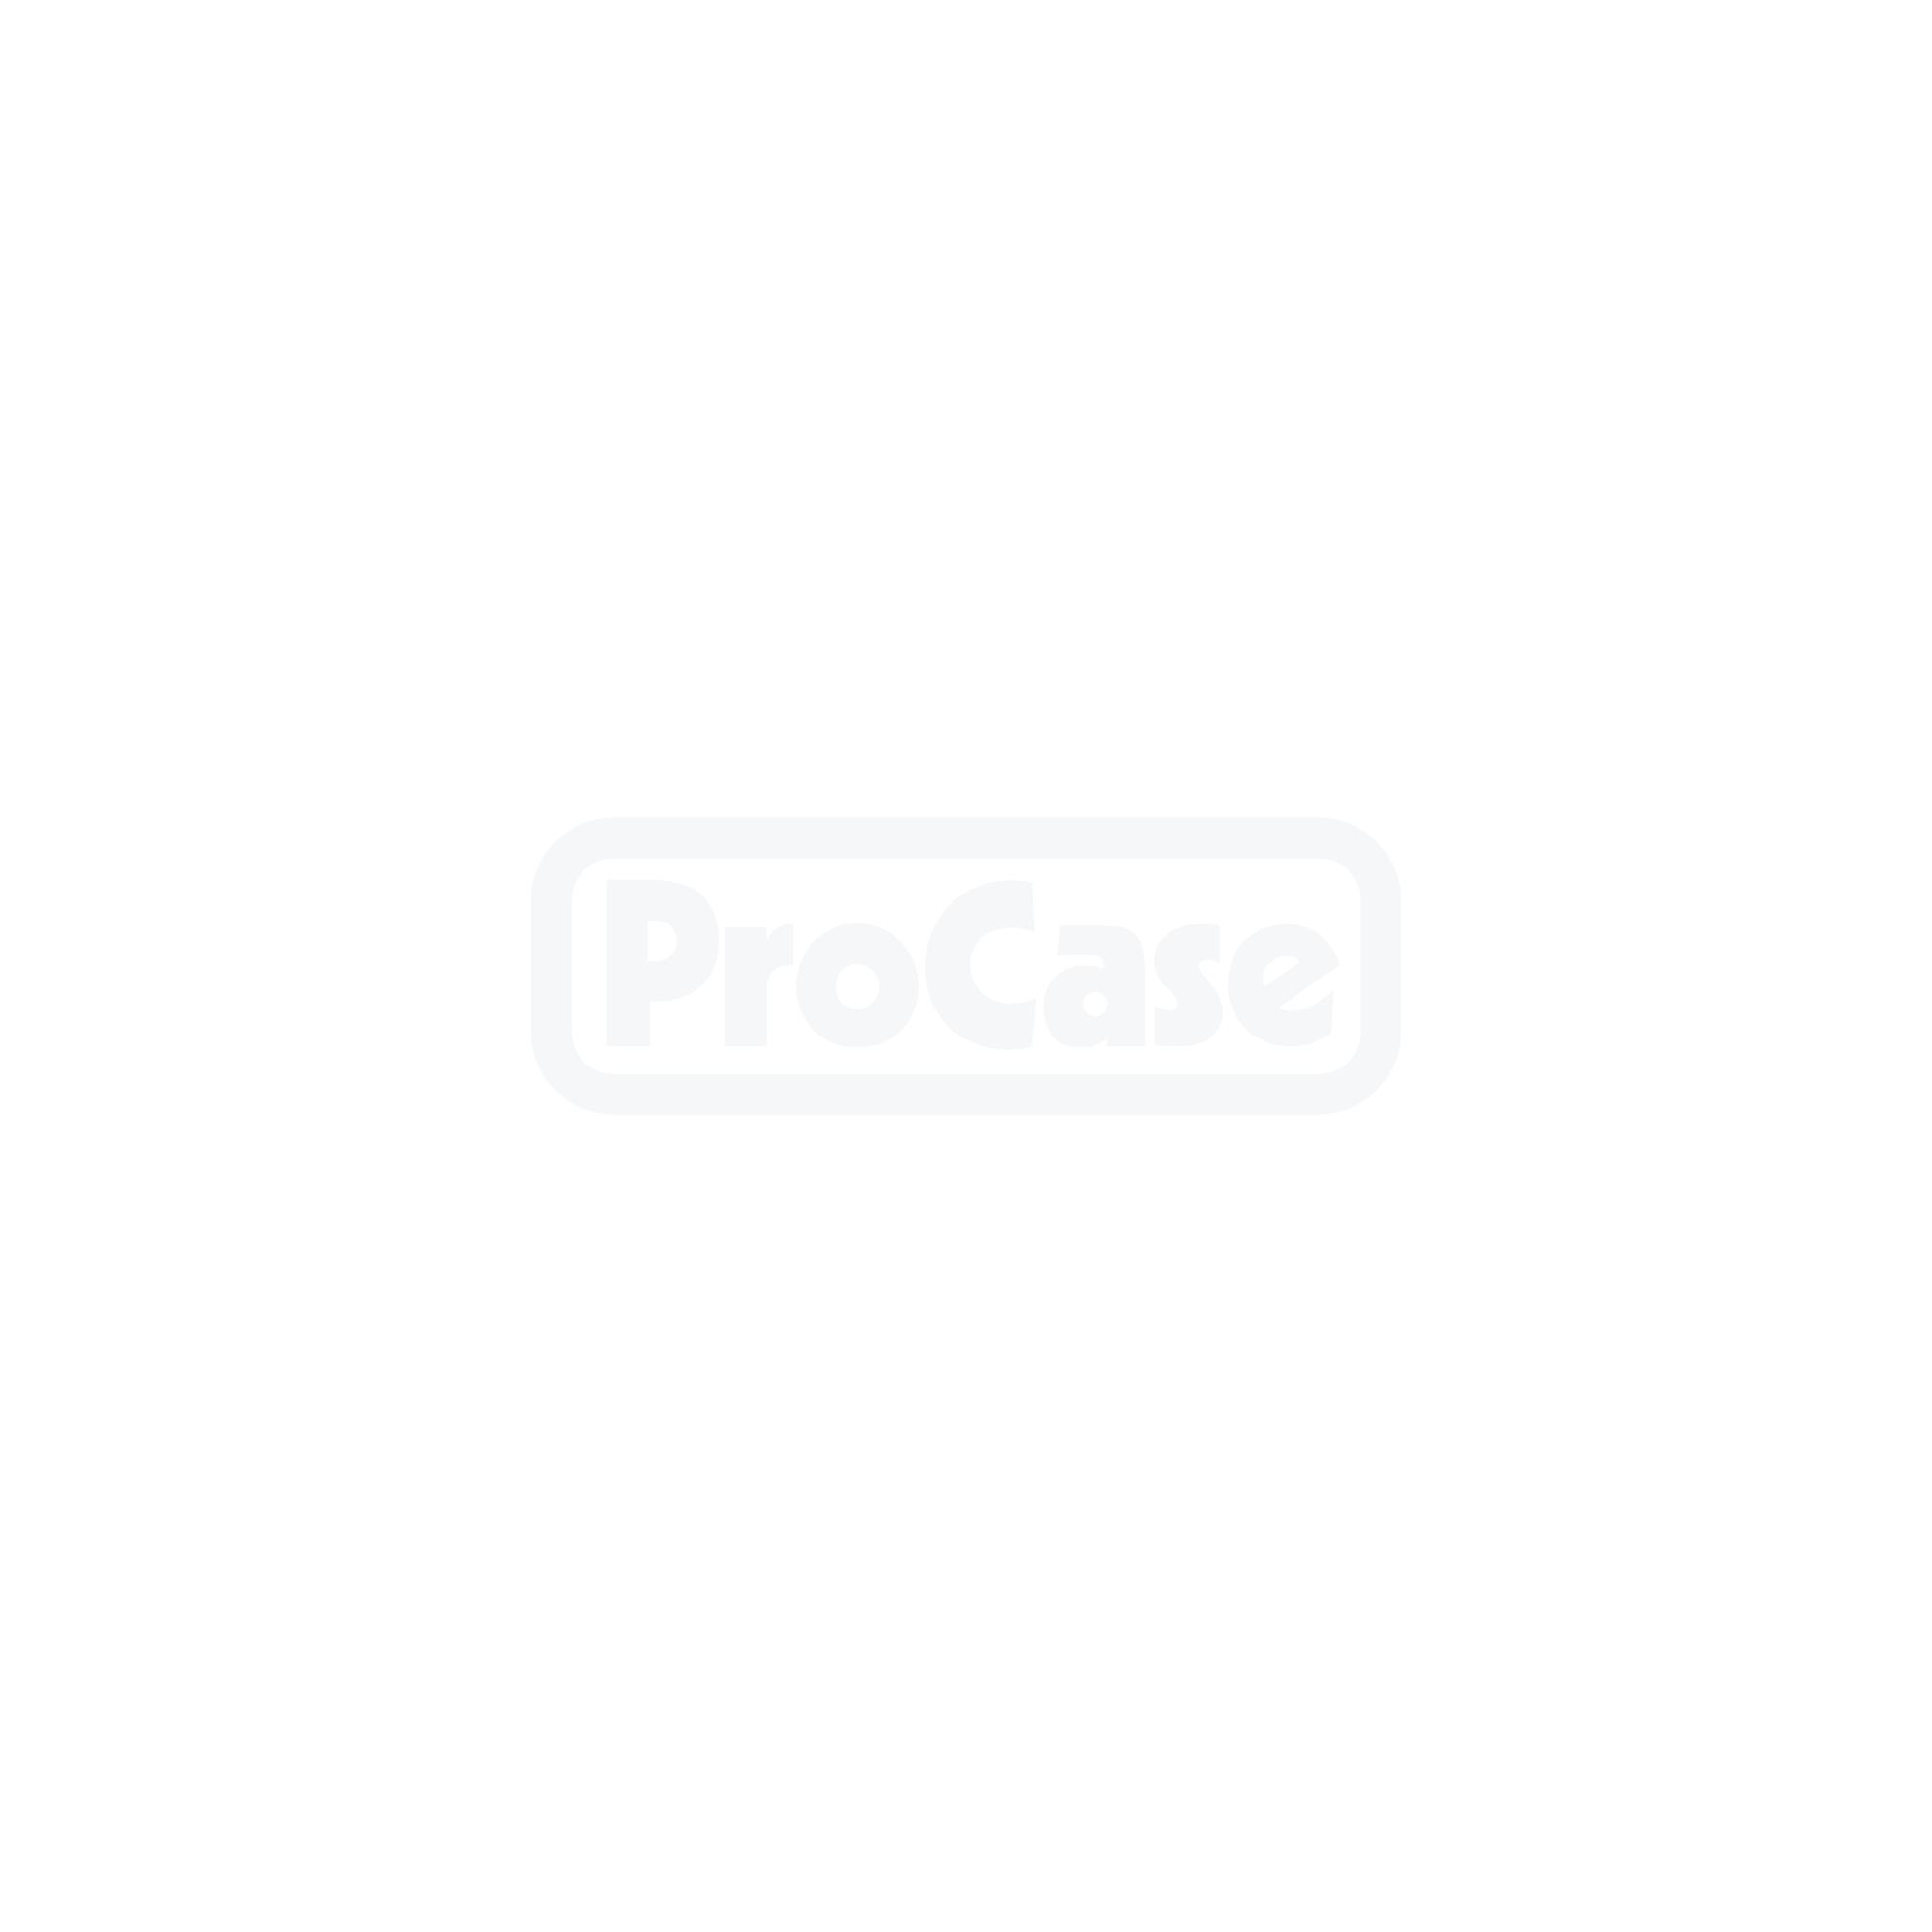 SKB 3i Koffer 3021-18B mit Rasterschaumstoff